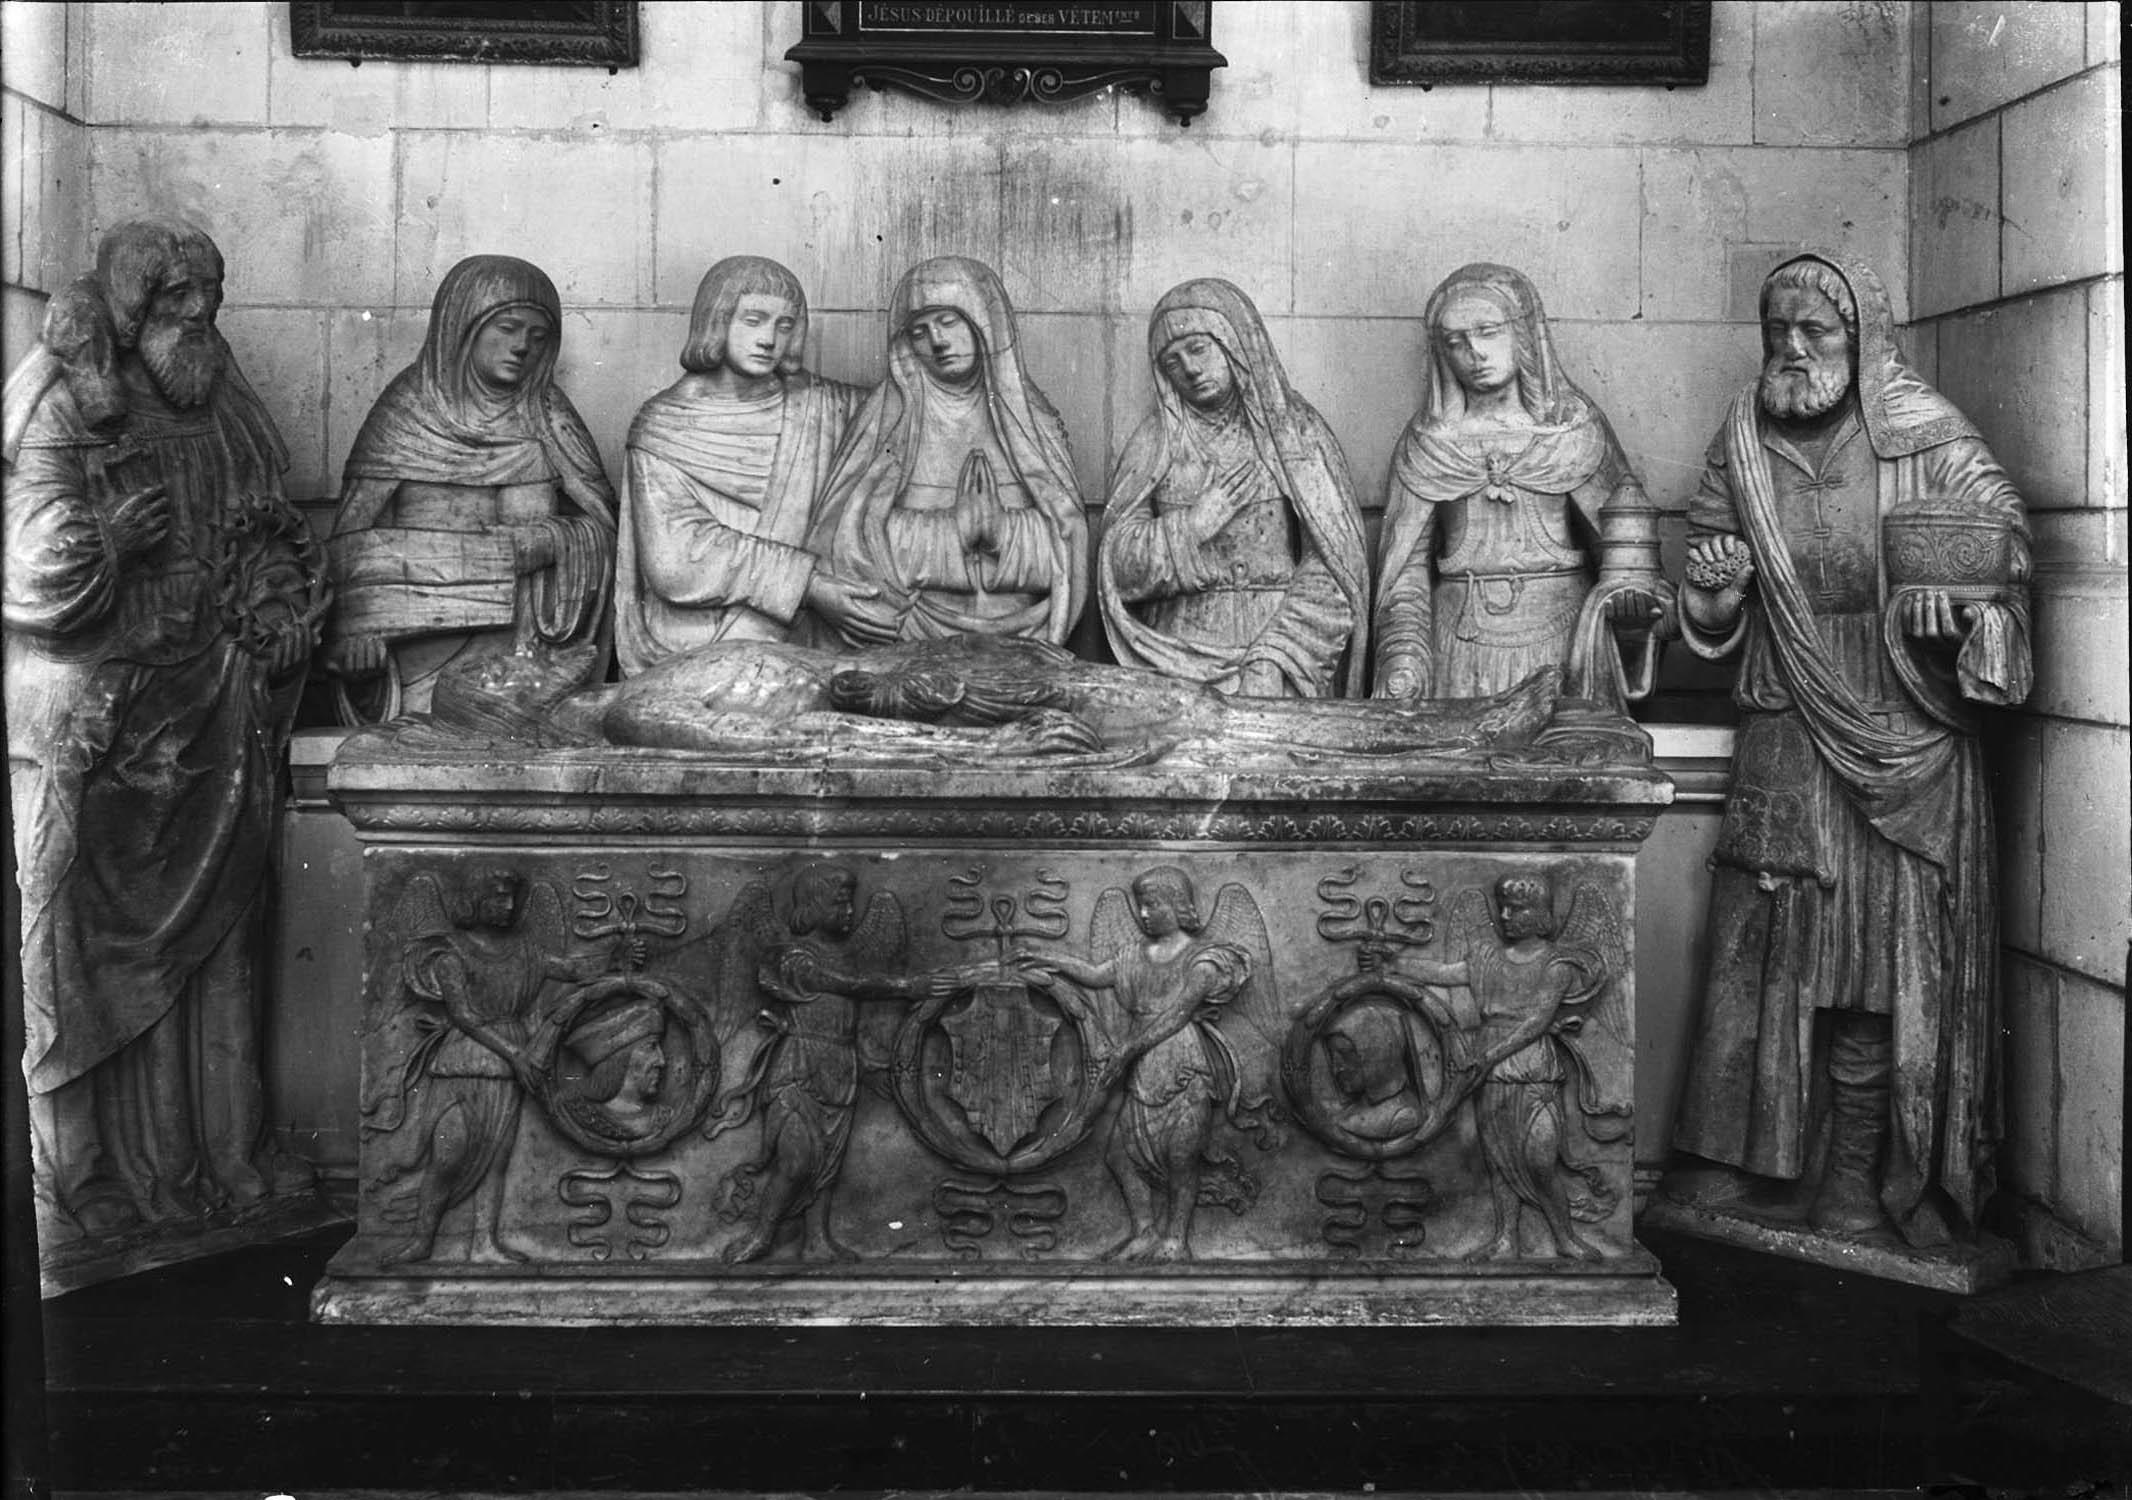 Groupe sculpté : Sépulcre